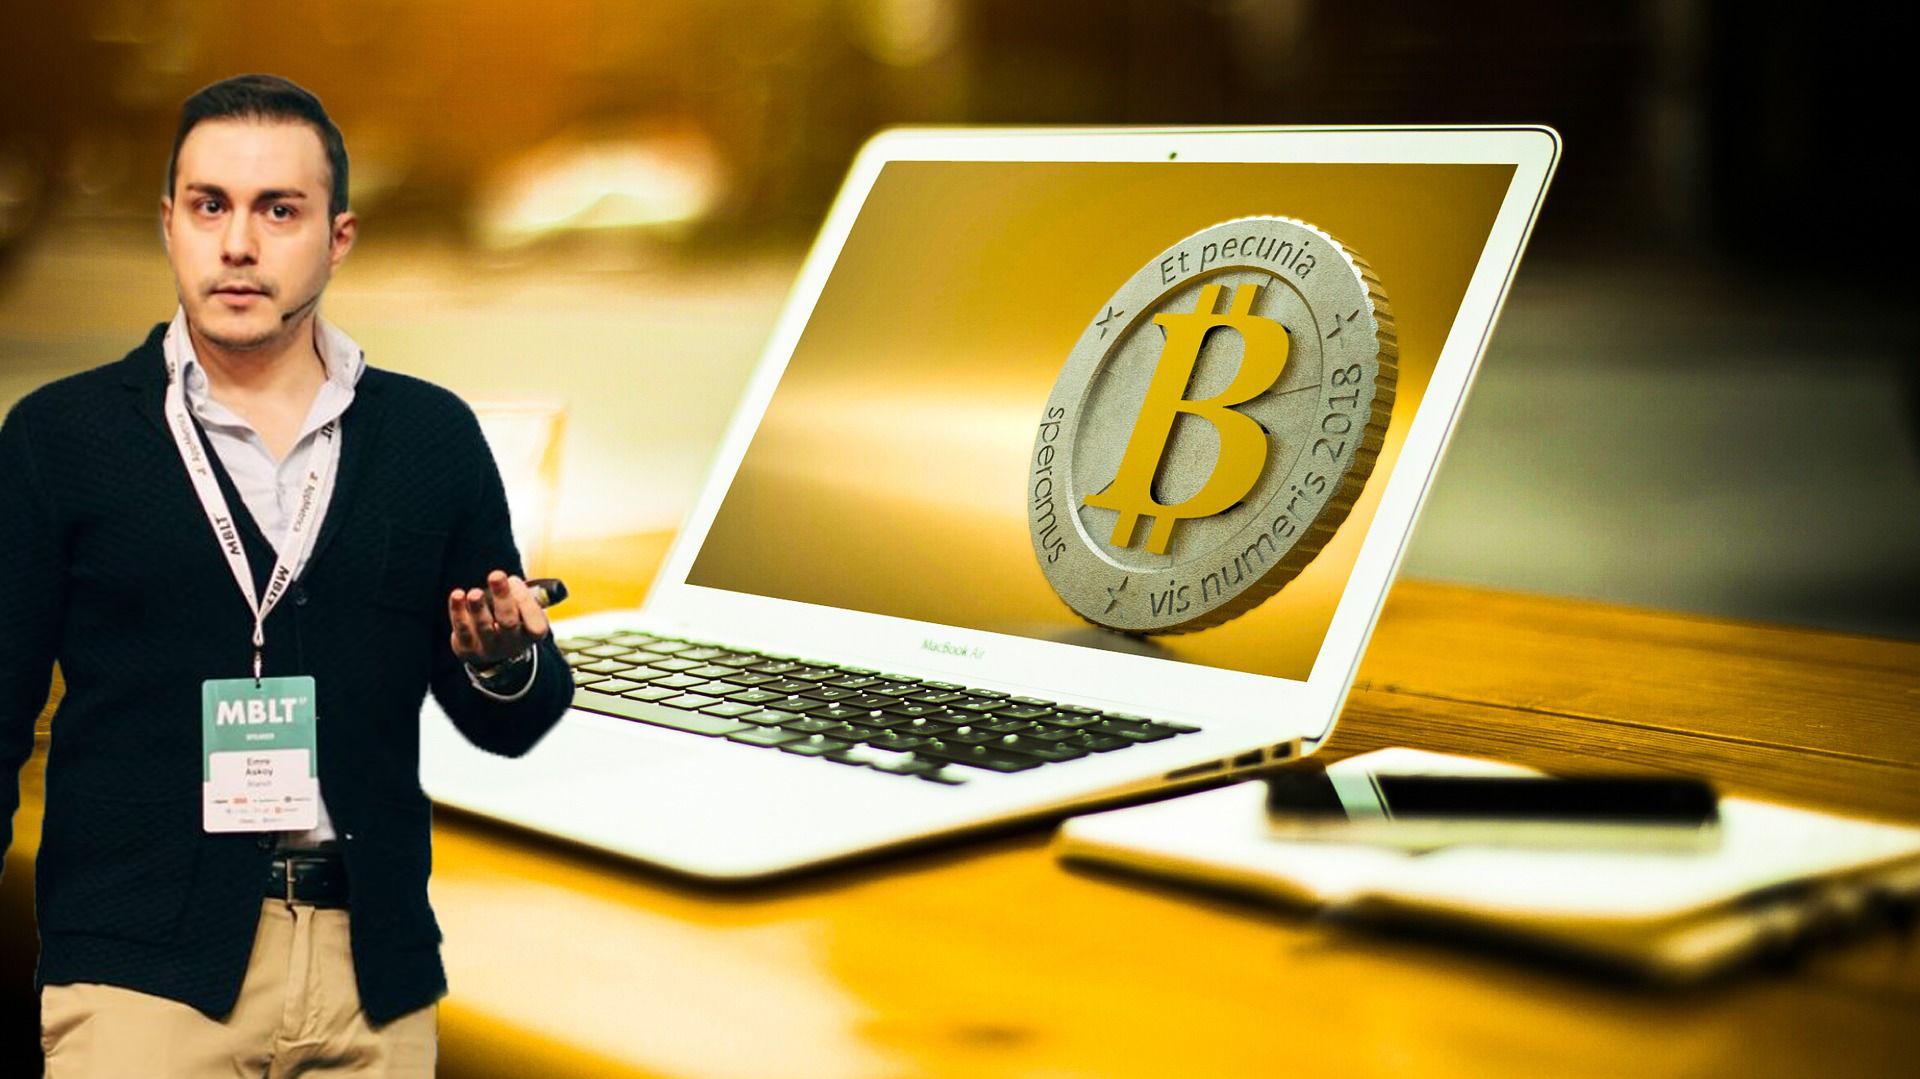 bitcoin kripto emre btc